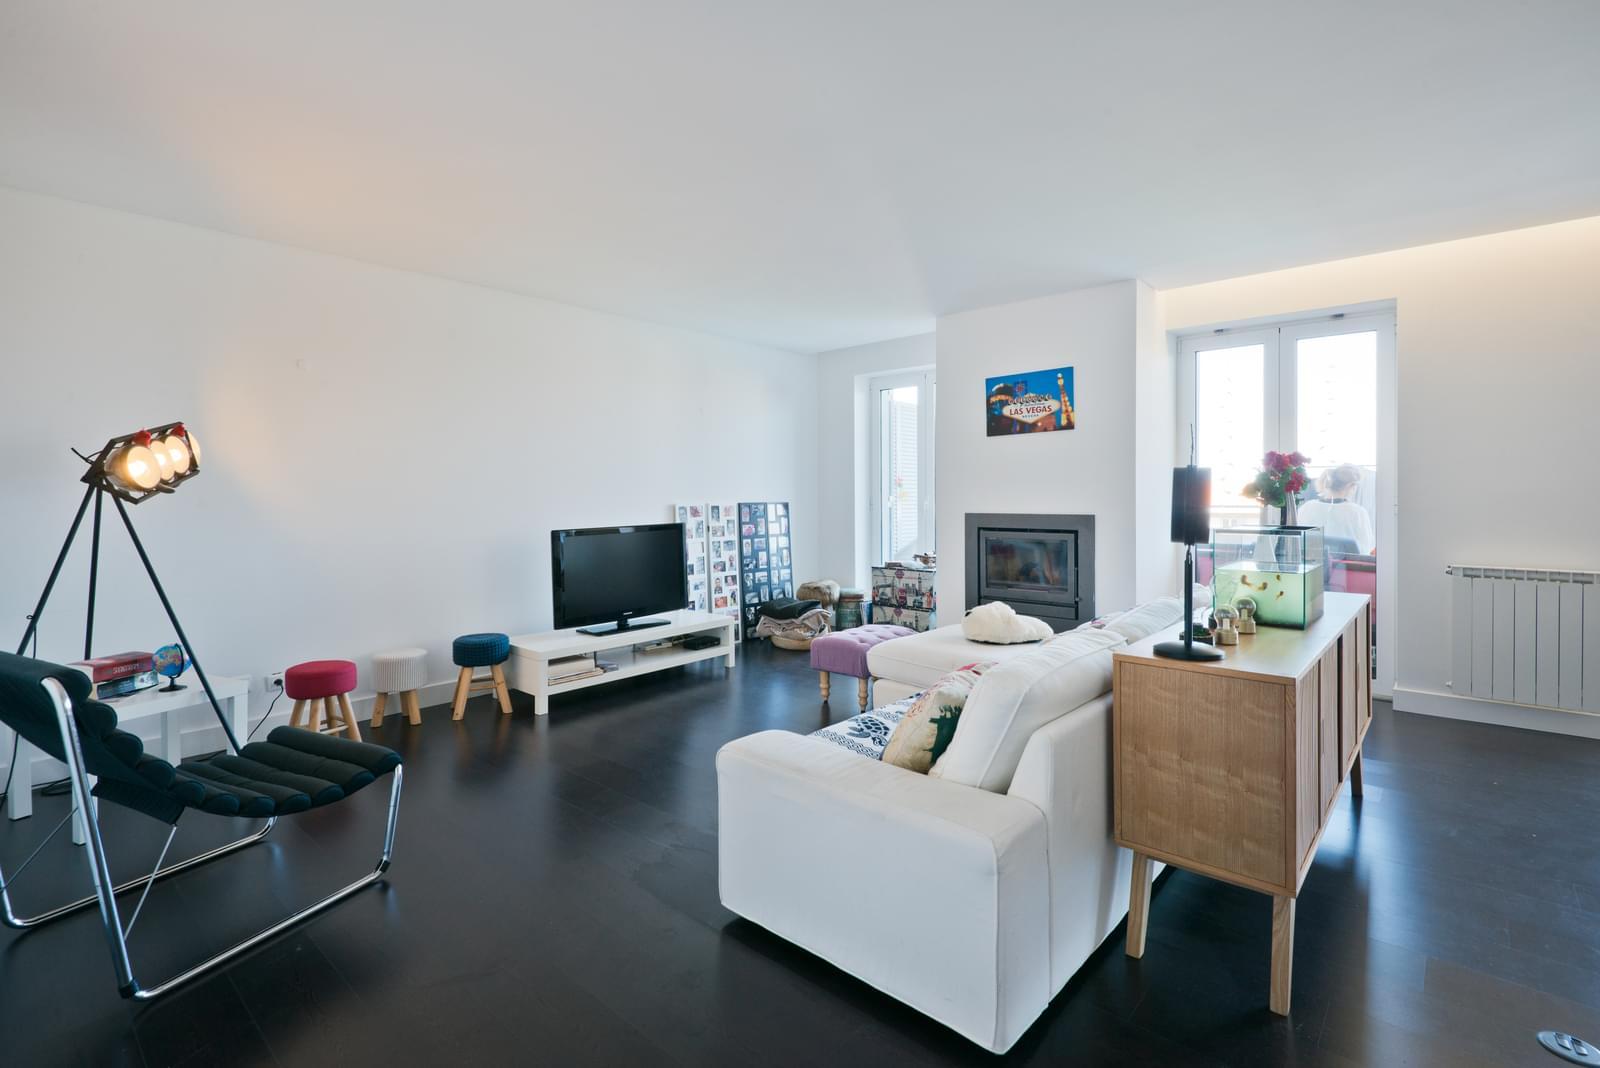 pf17099-apartamento-t3-sintra-caa169eb-3e7f-43c9-b0de-e0f3f70a9761